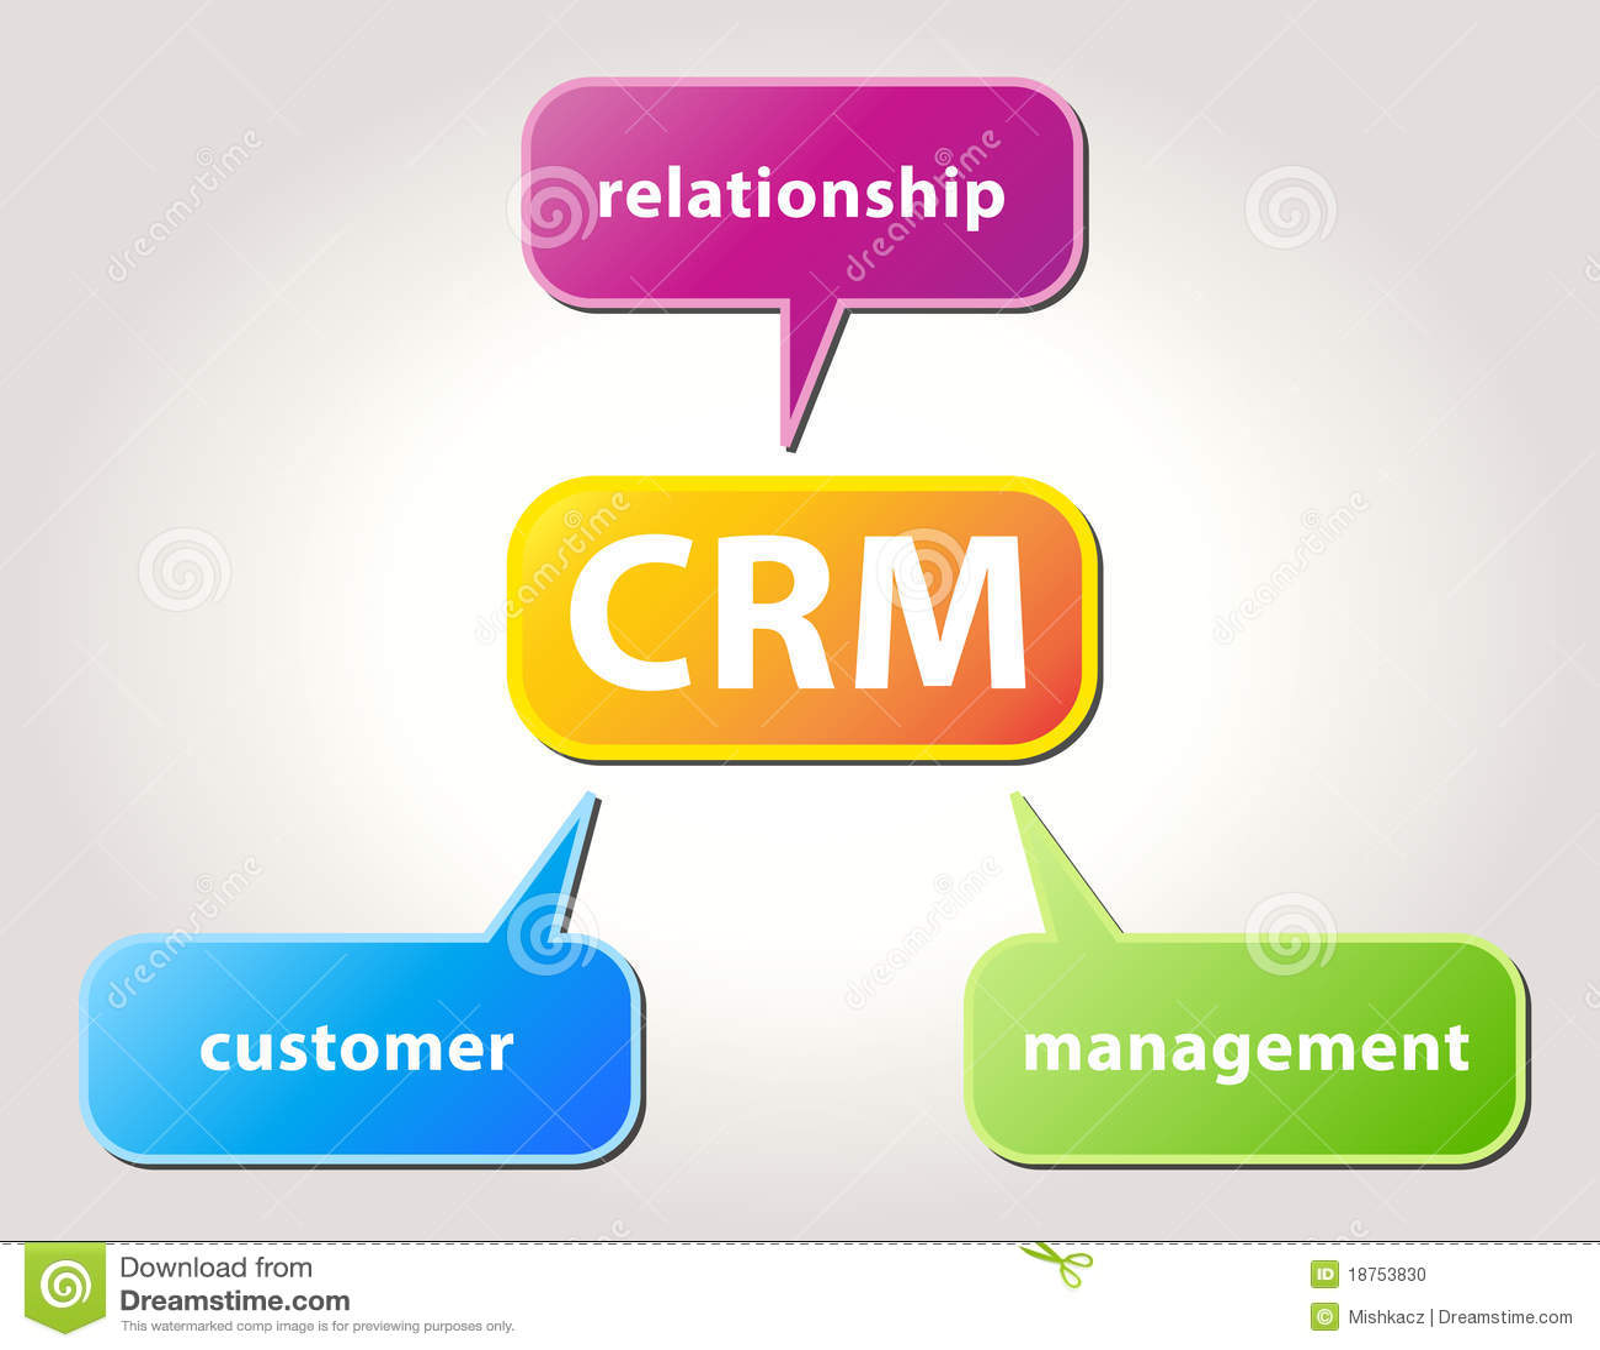 Customer relationship management plan